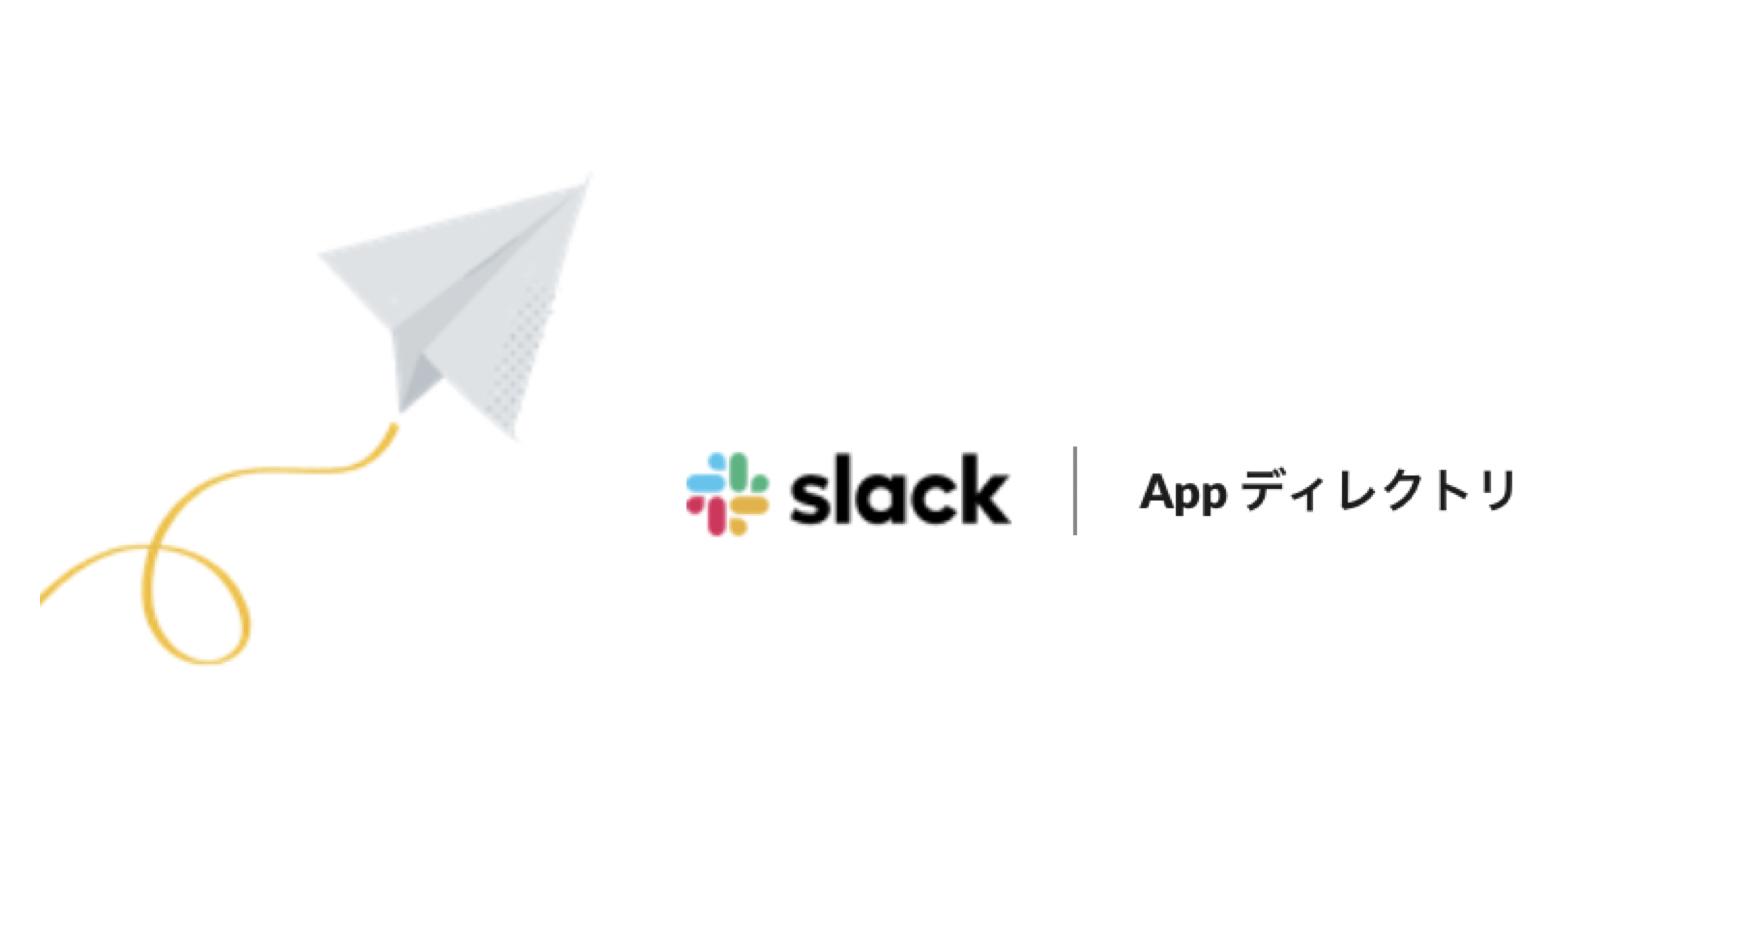 Slack(スラック)連携で便利なアプリをまとめて紹介!